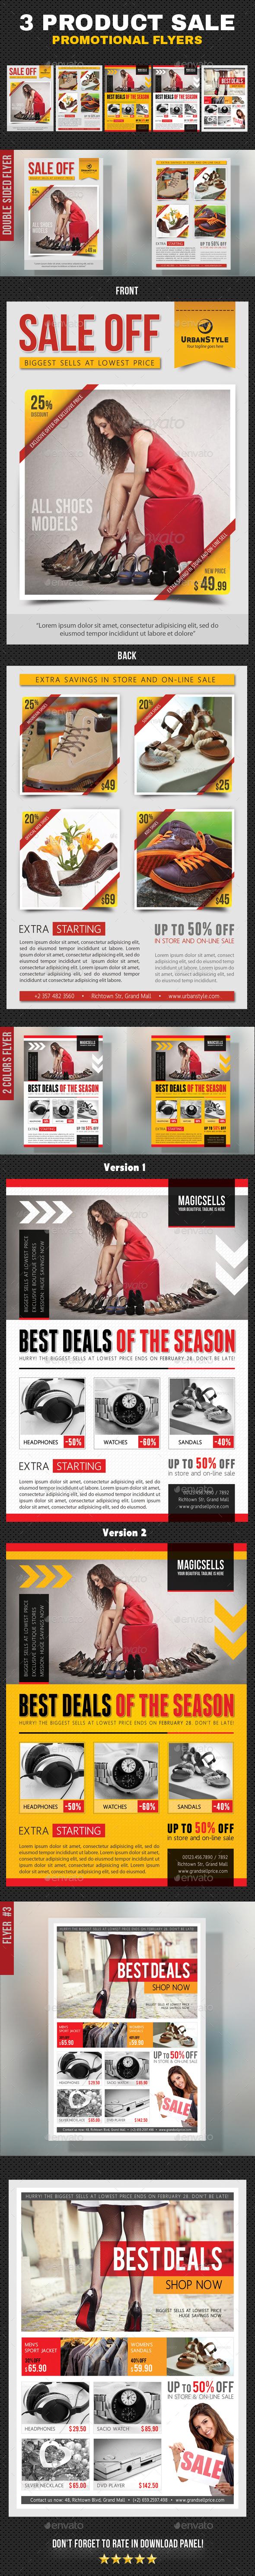 3 in 1 Product Sale Promotion Flyer Bundle - Commerce Flyers